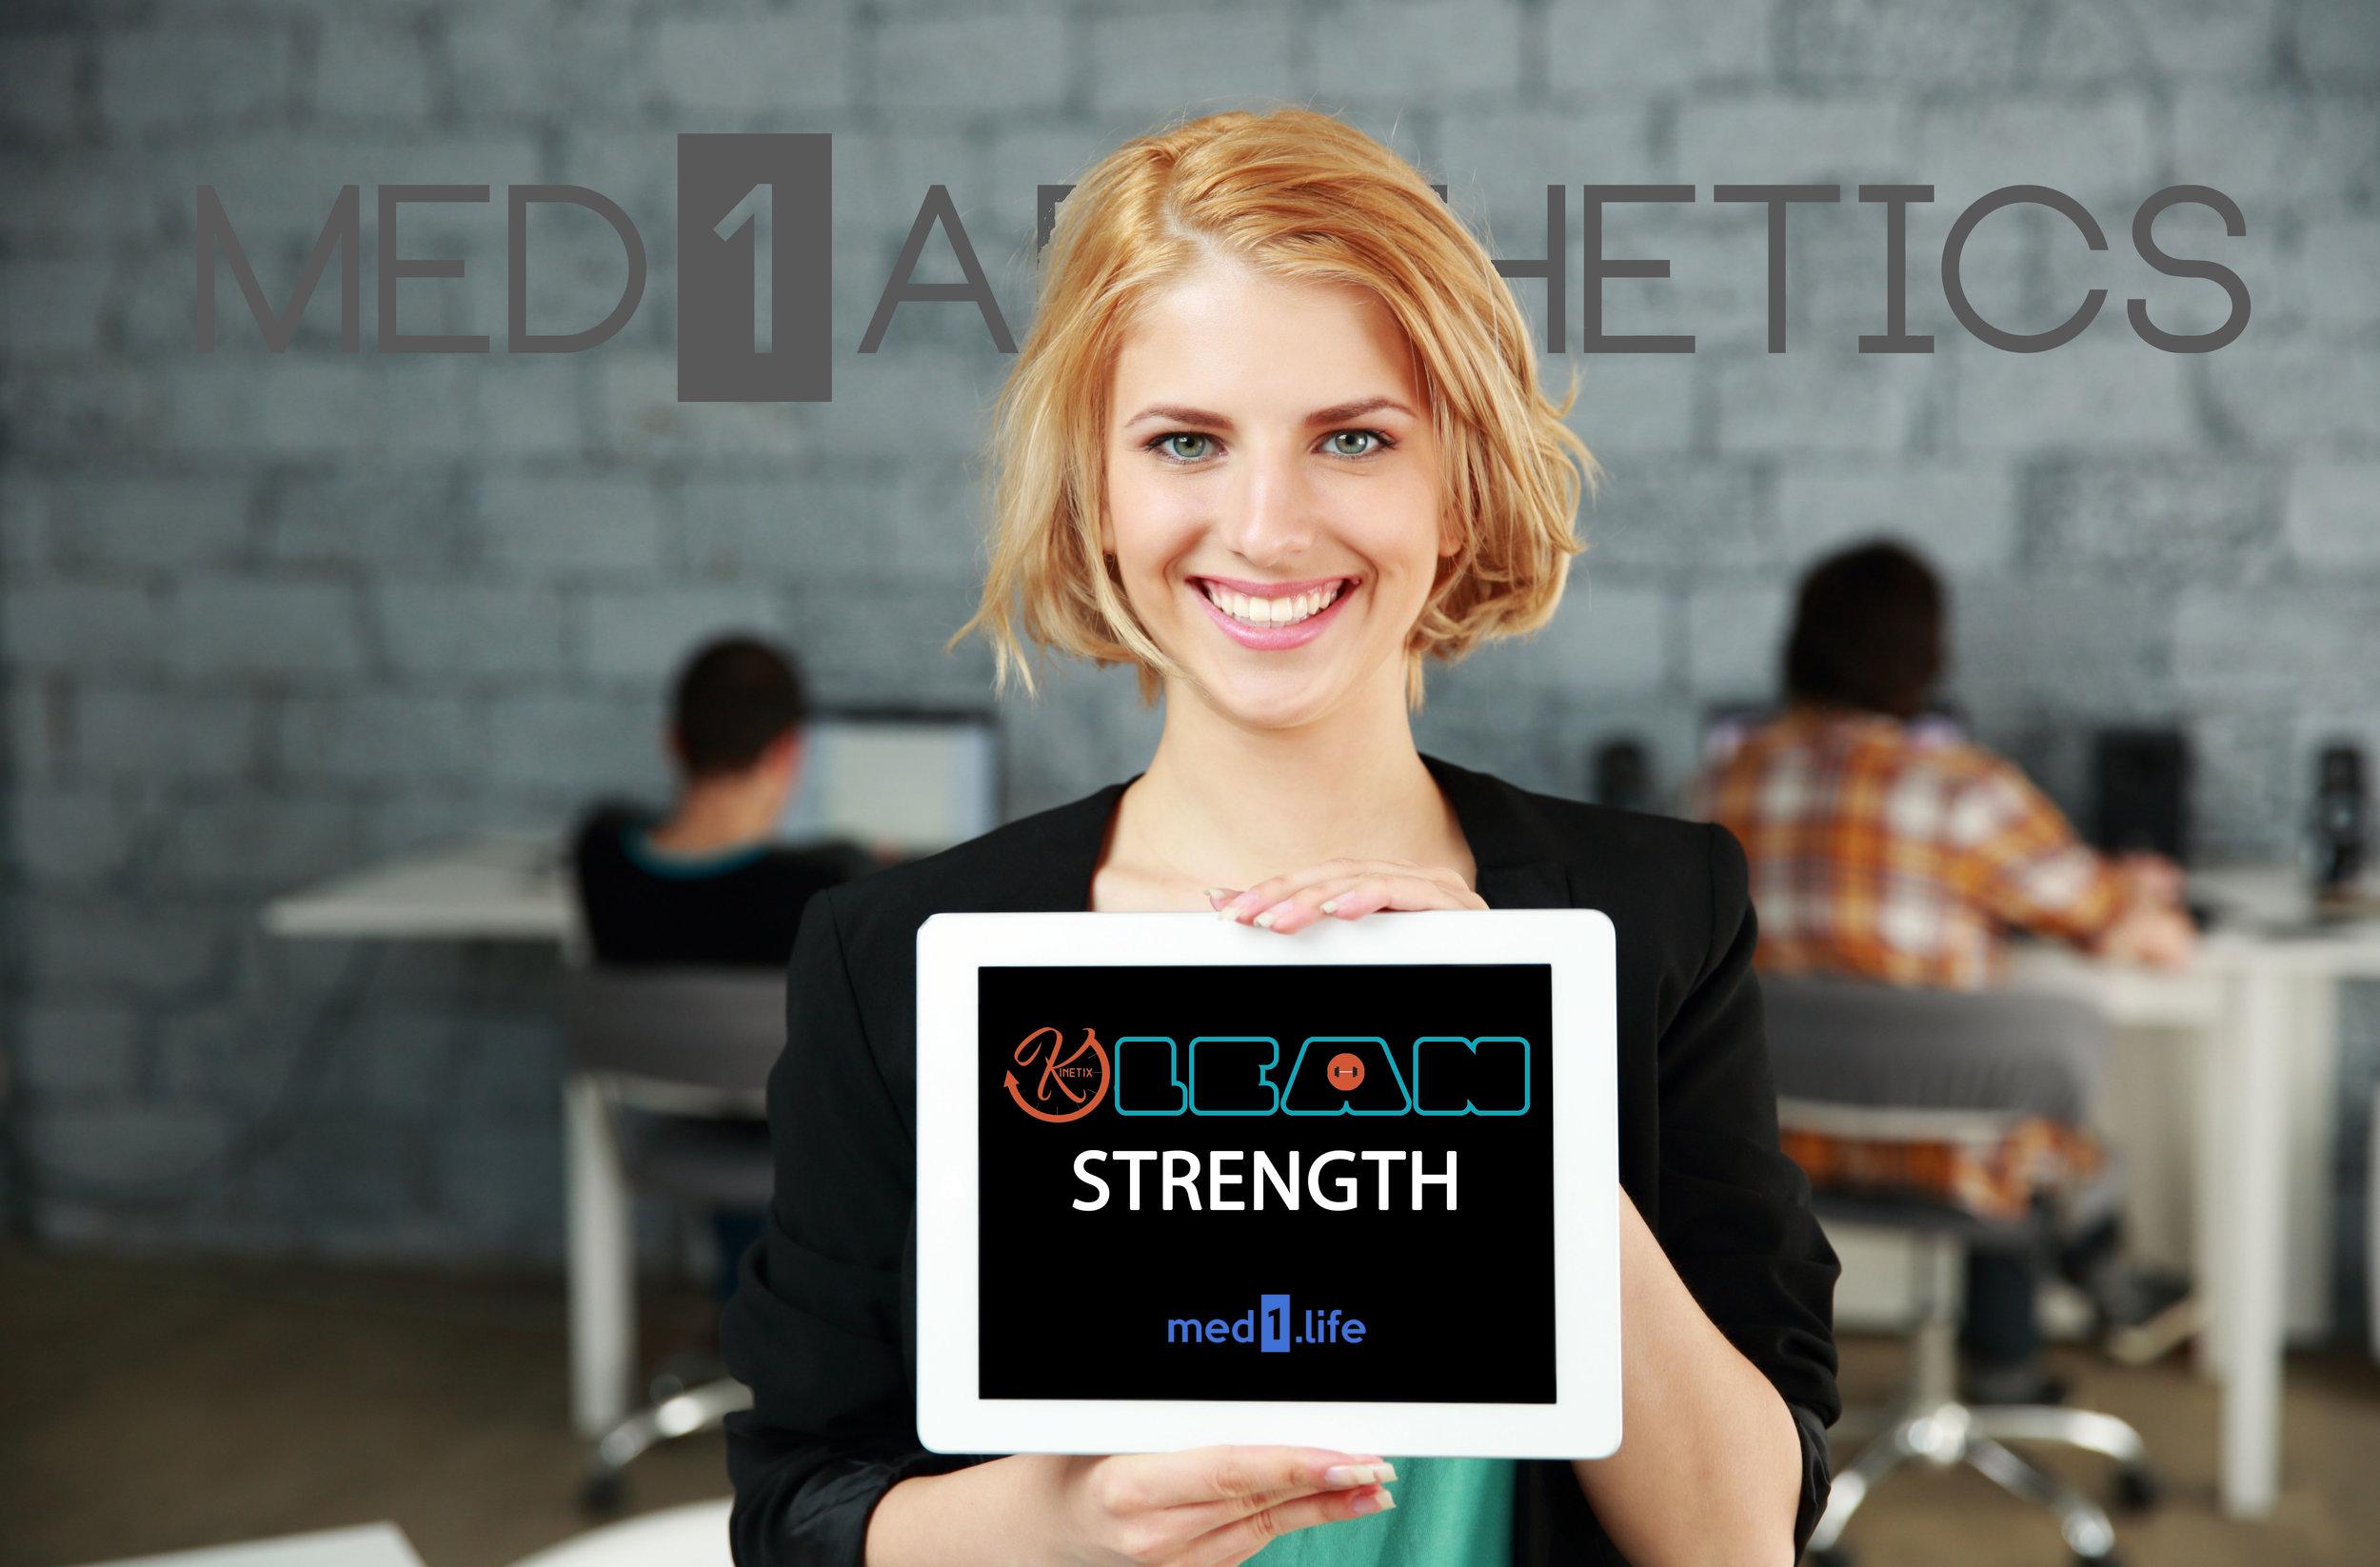 klean strength ipad image with girl.jpg